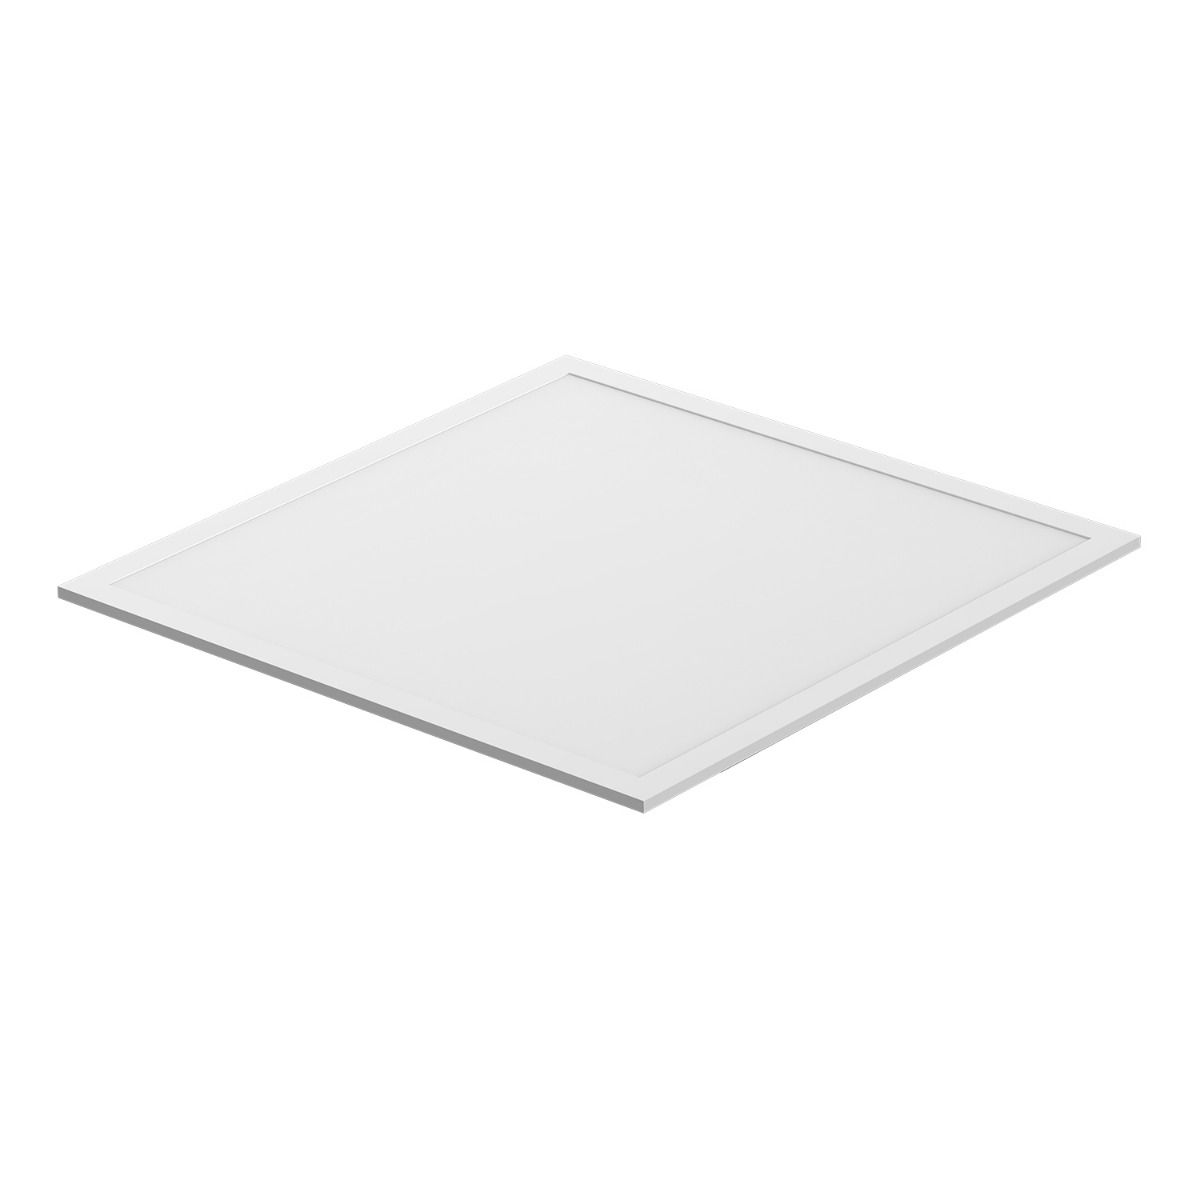 Noxion Panel LED Delta Pro Highlum V2.0 Xitanium DALI 40W 60x60cm 3000K 5280lm UGR <19 | Dali Regulable - Luz Cálida - Reemplazo 4x18W